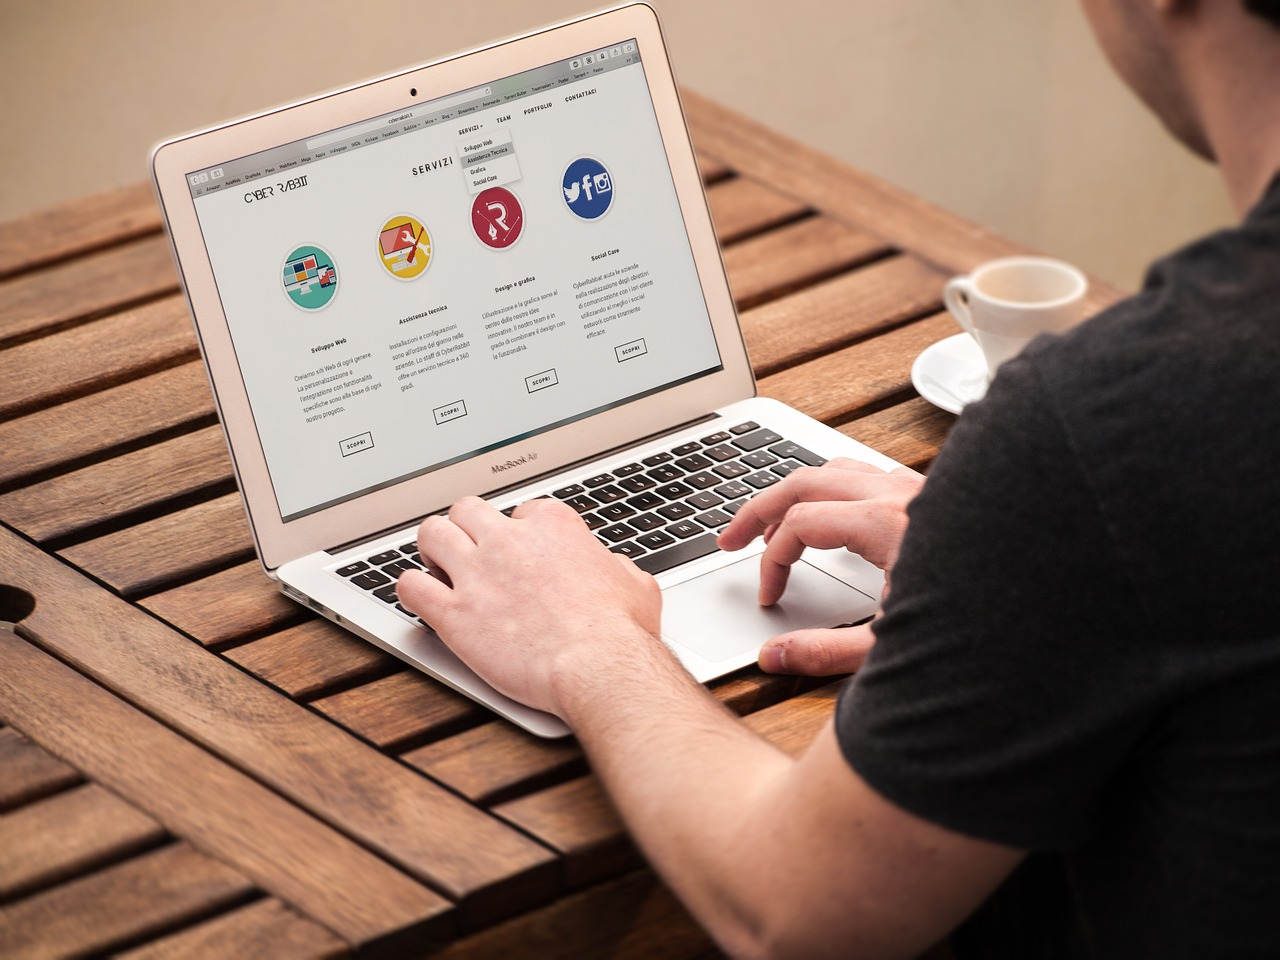 Website design is pattern informed by sensibility.